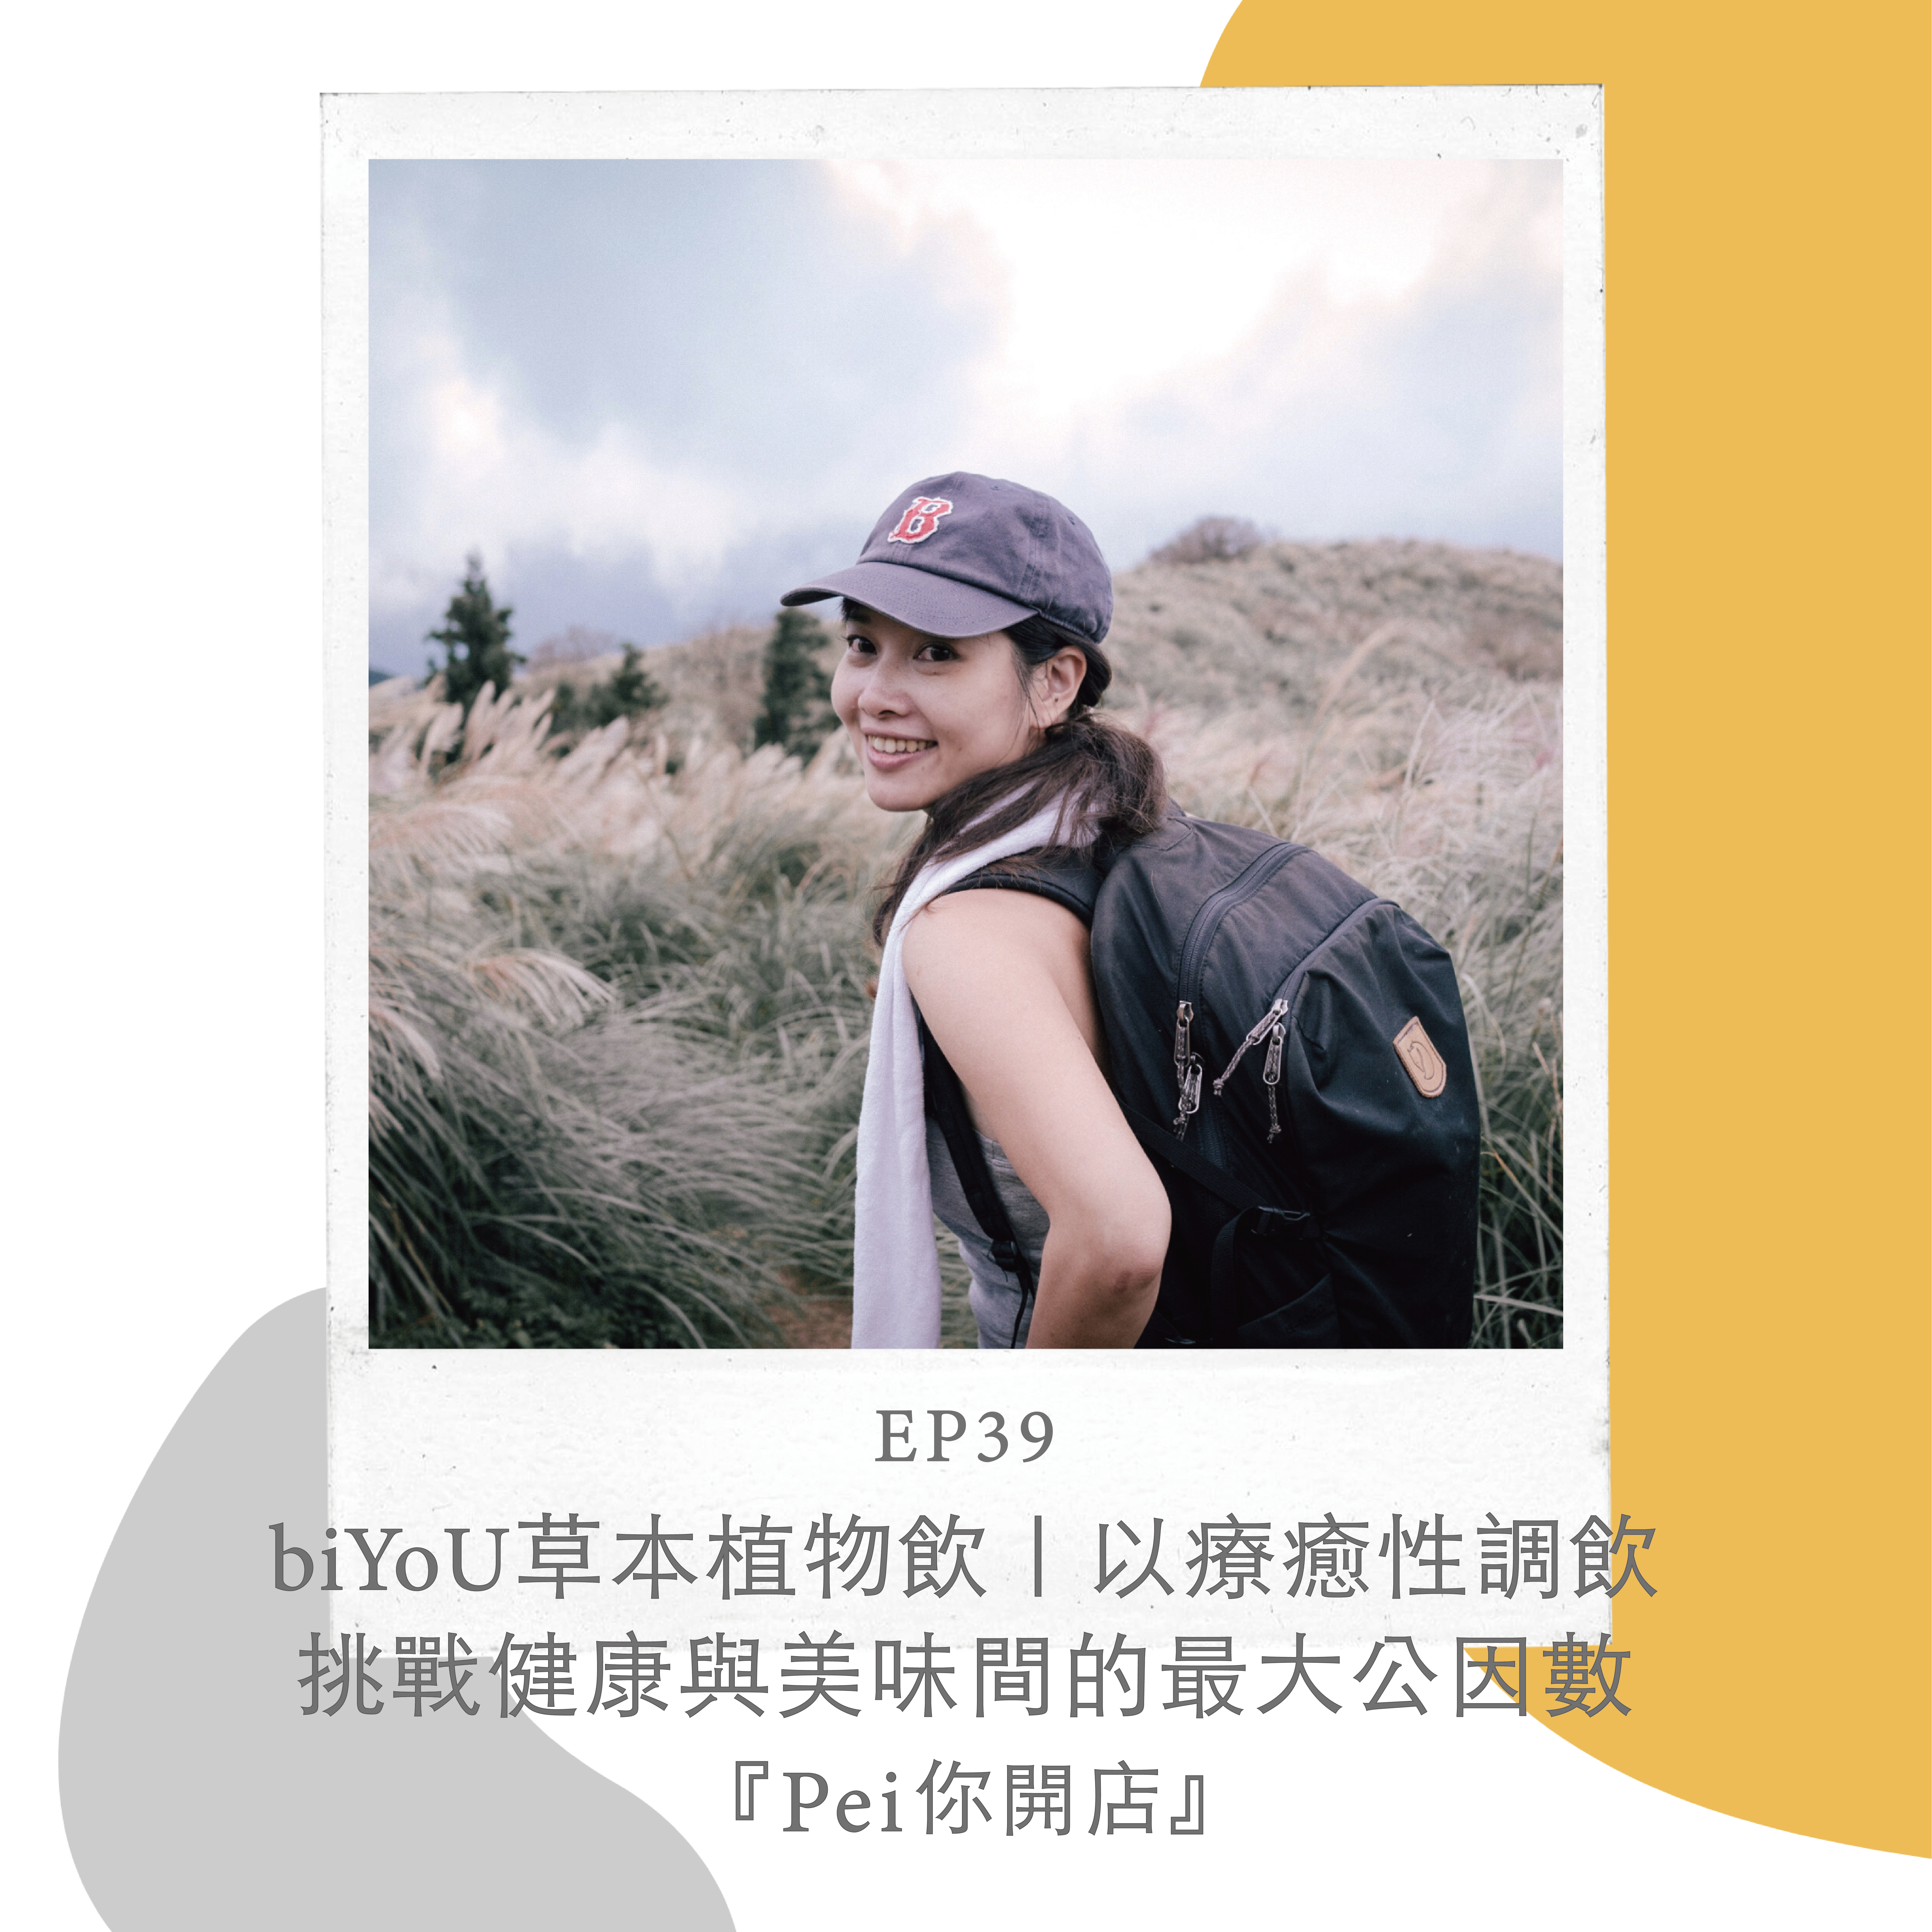 EP39『Pei你開店』biYoU 草本植物飲 以療癒性調飲挑戰健康與美味間的最大公因數 with Alyson Yu